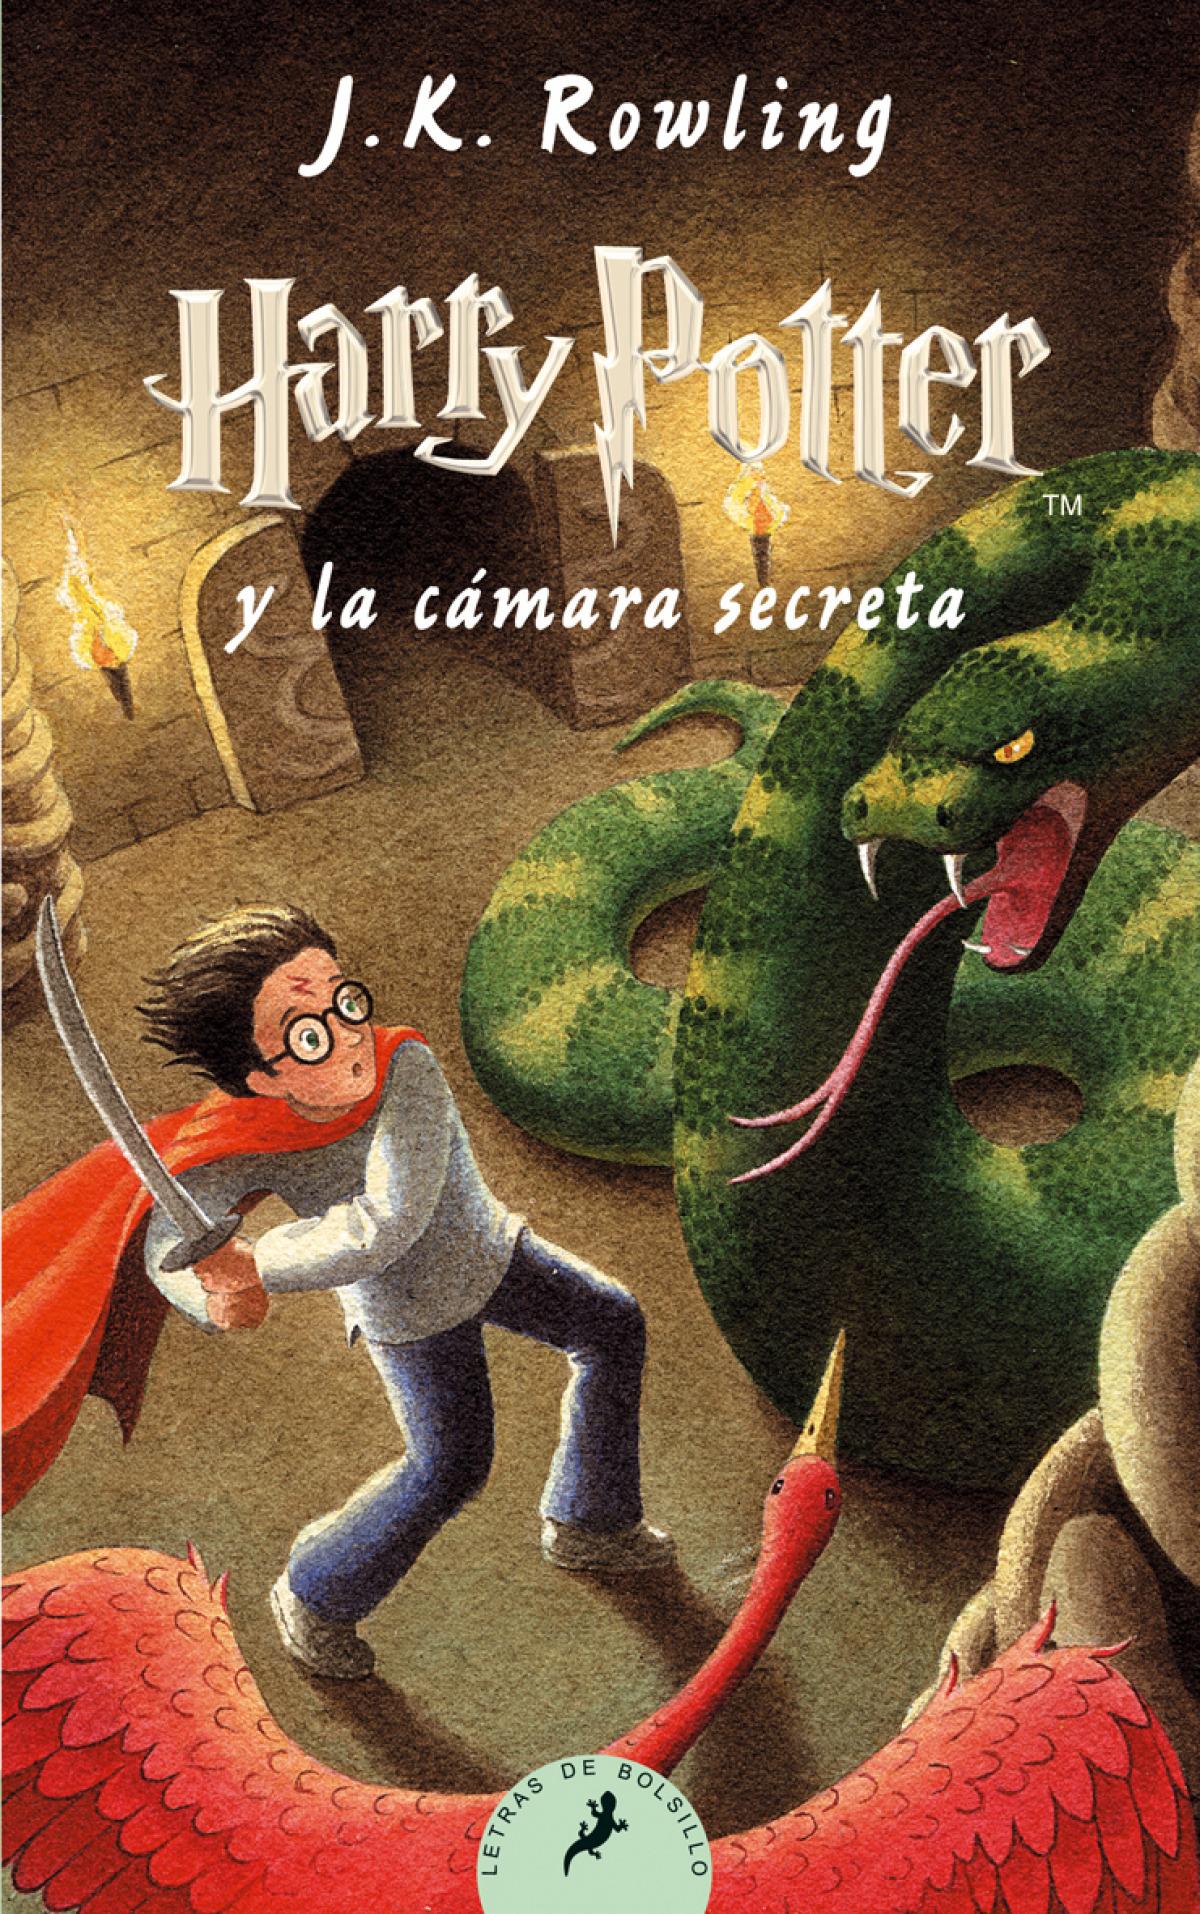 Harry potter y la camara secreta 9788498382679